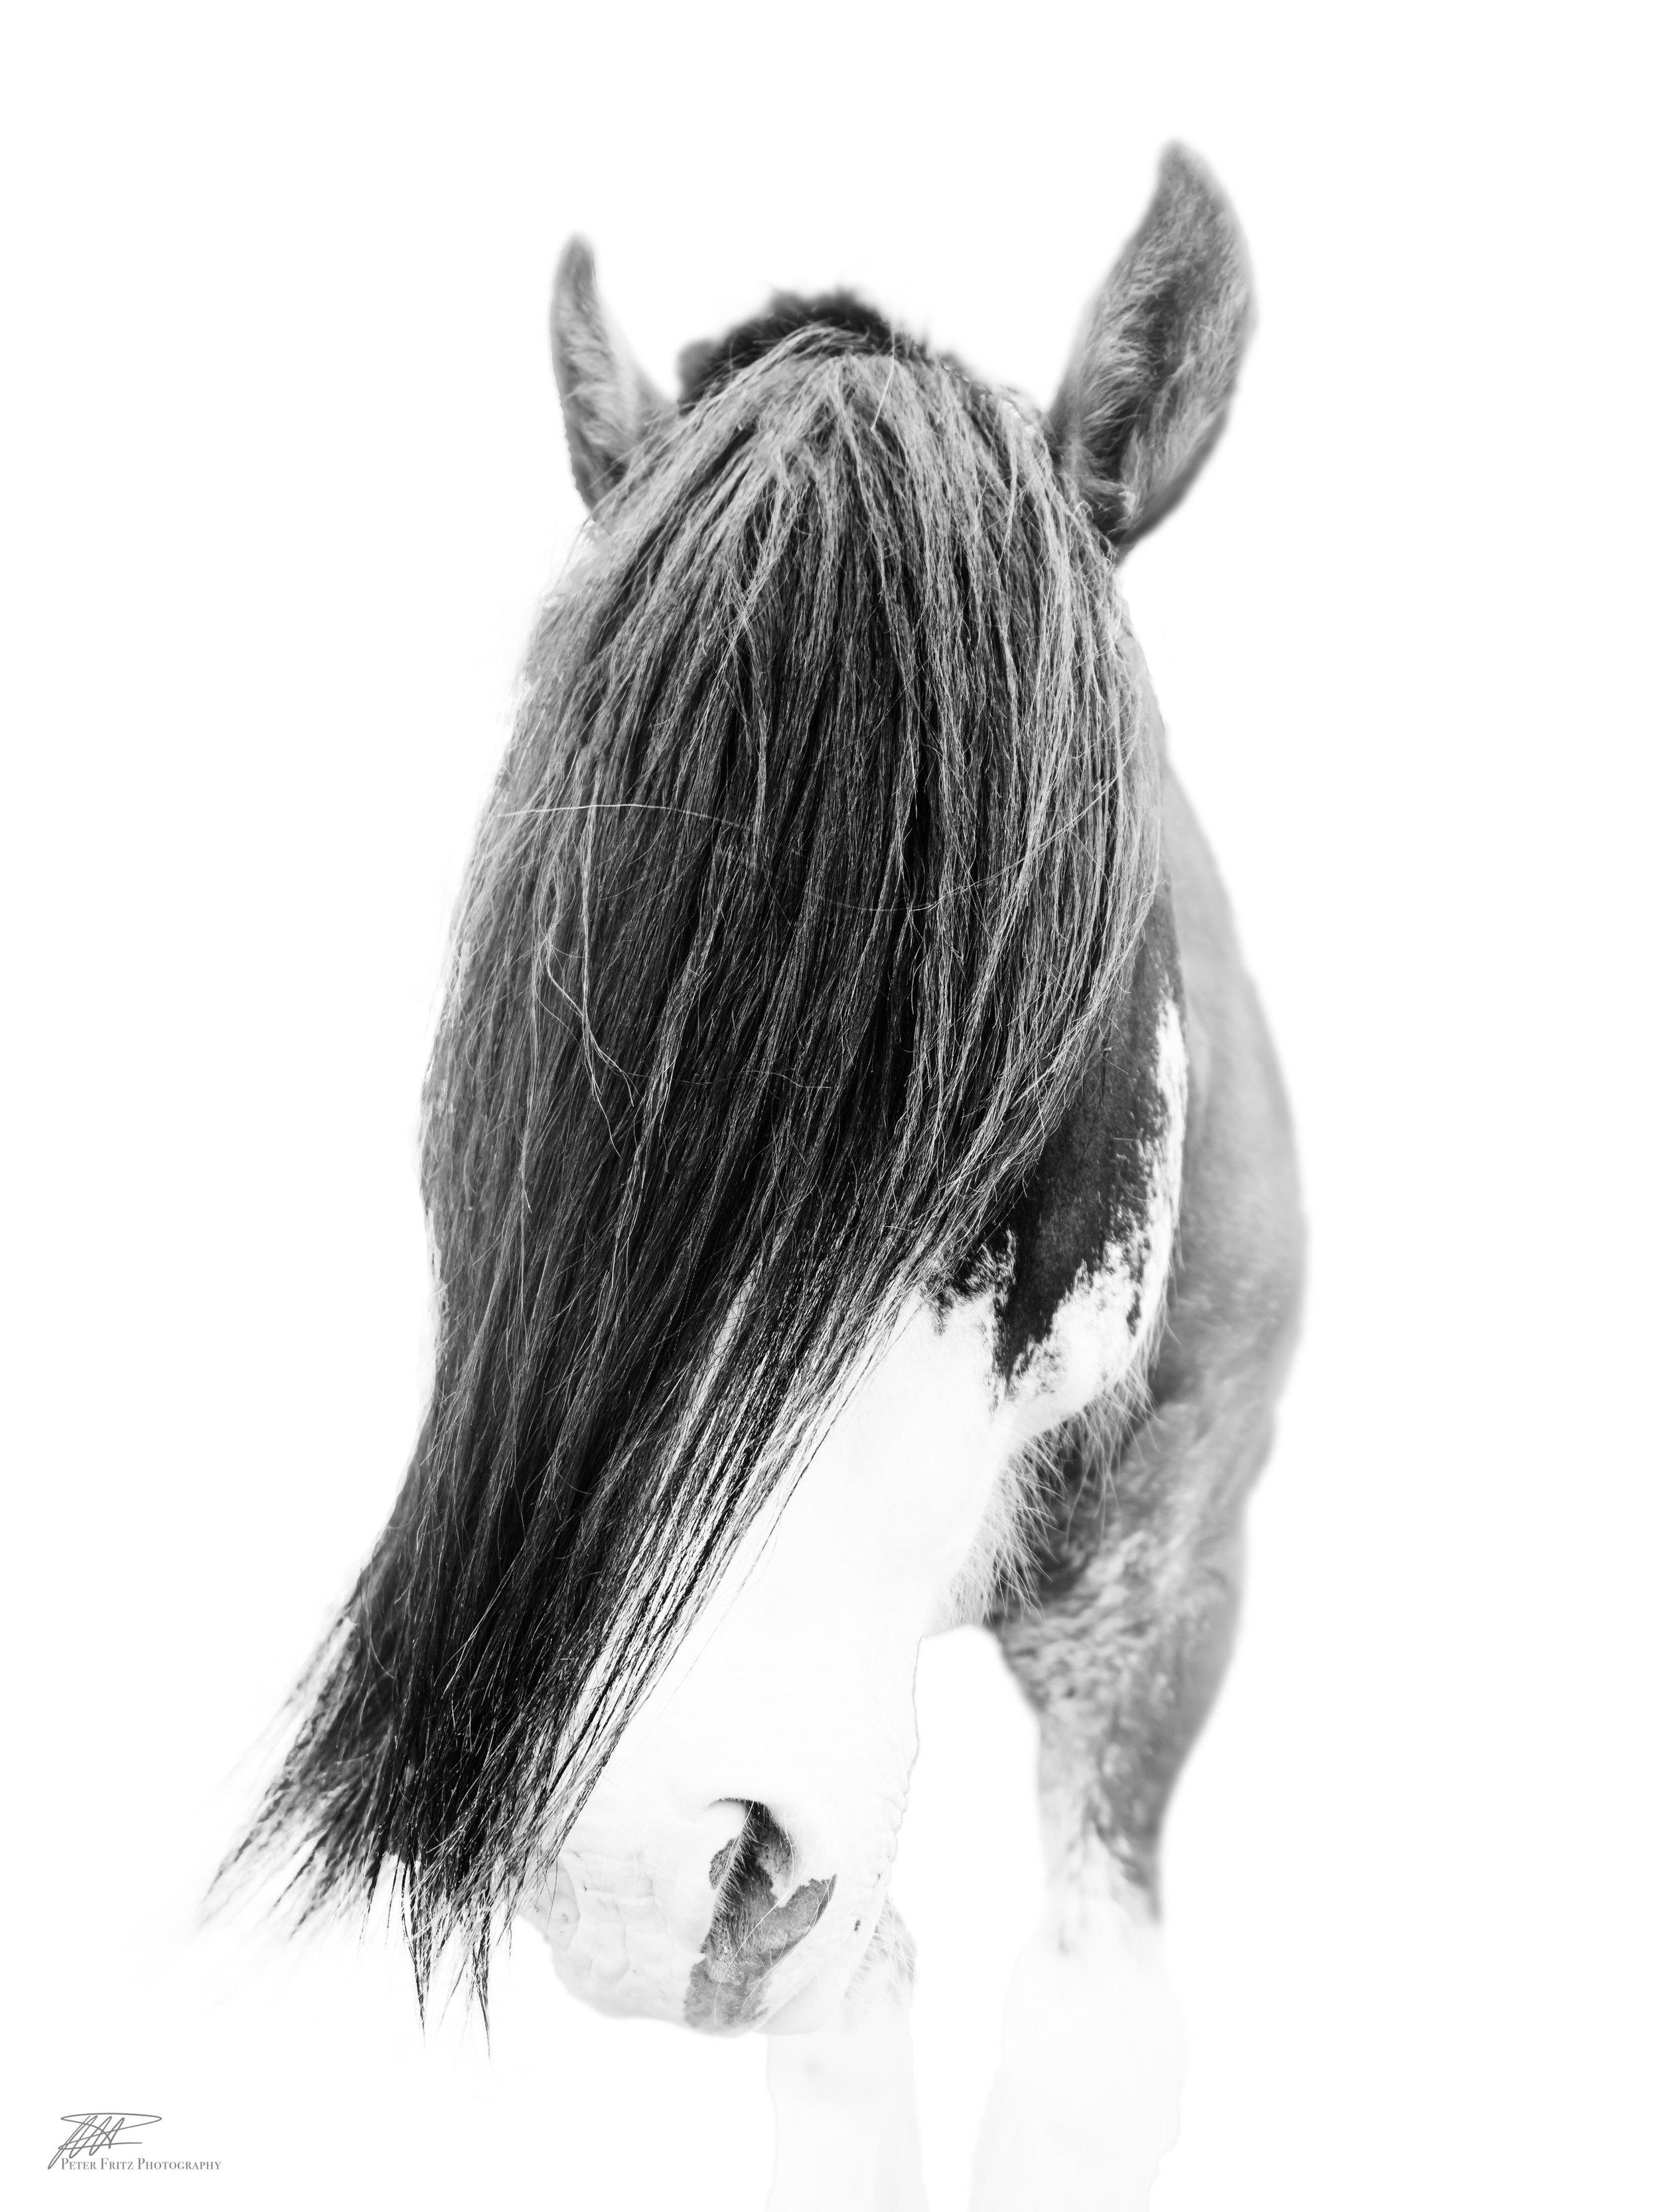 Shy Horse 4x3.jpg